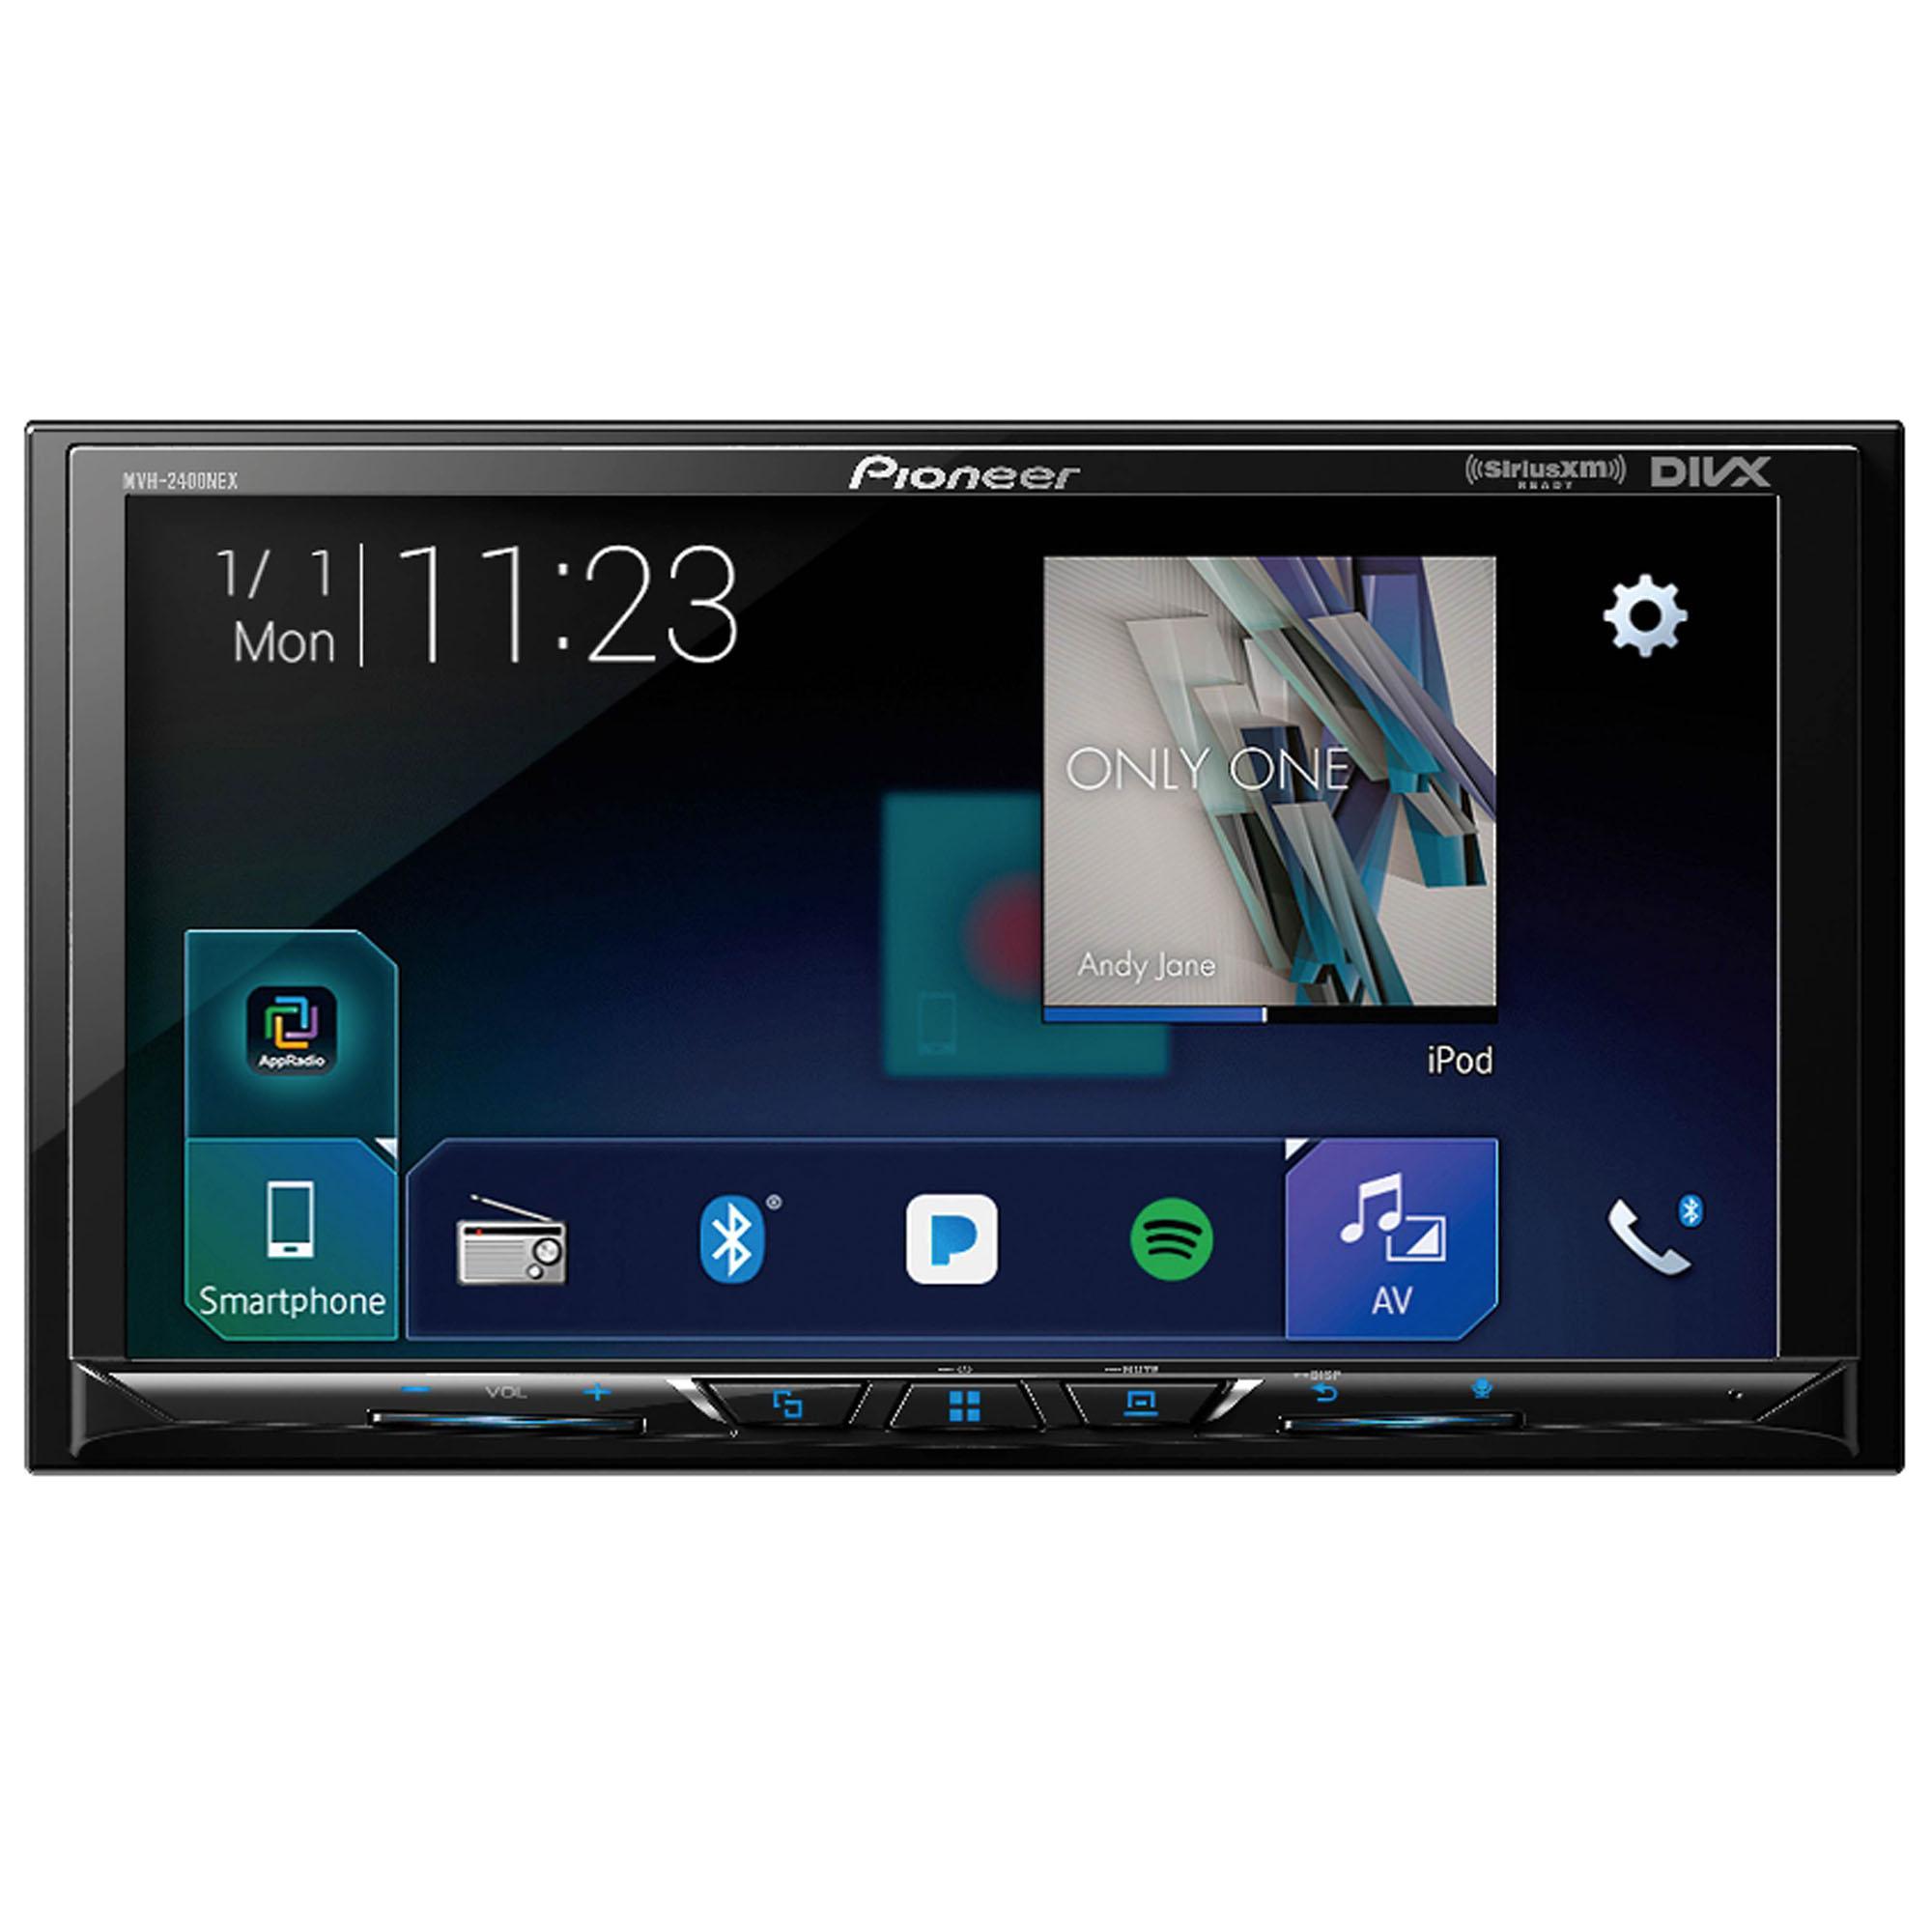 7 Double Din Touchscreen Apple Carplay Multimedia Video Receiver